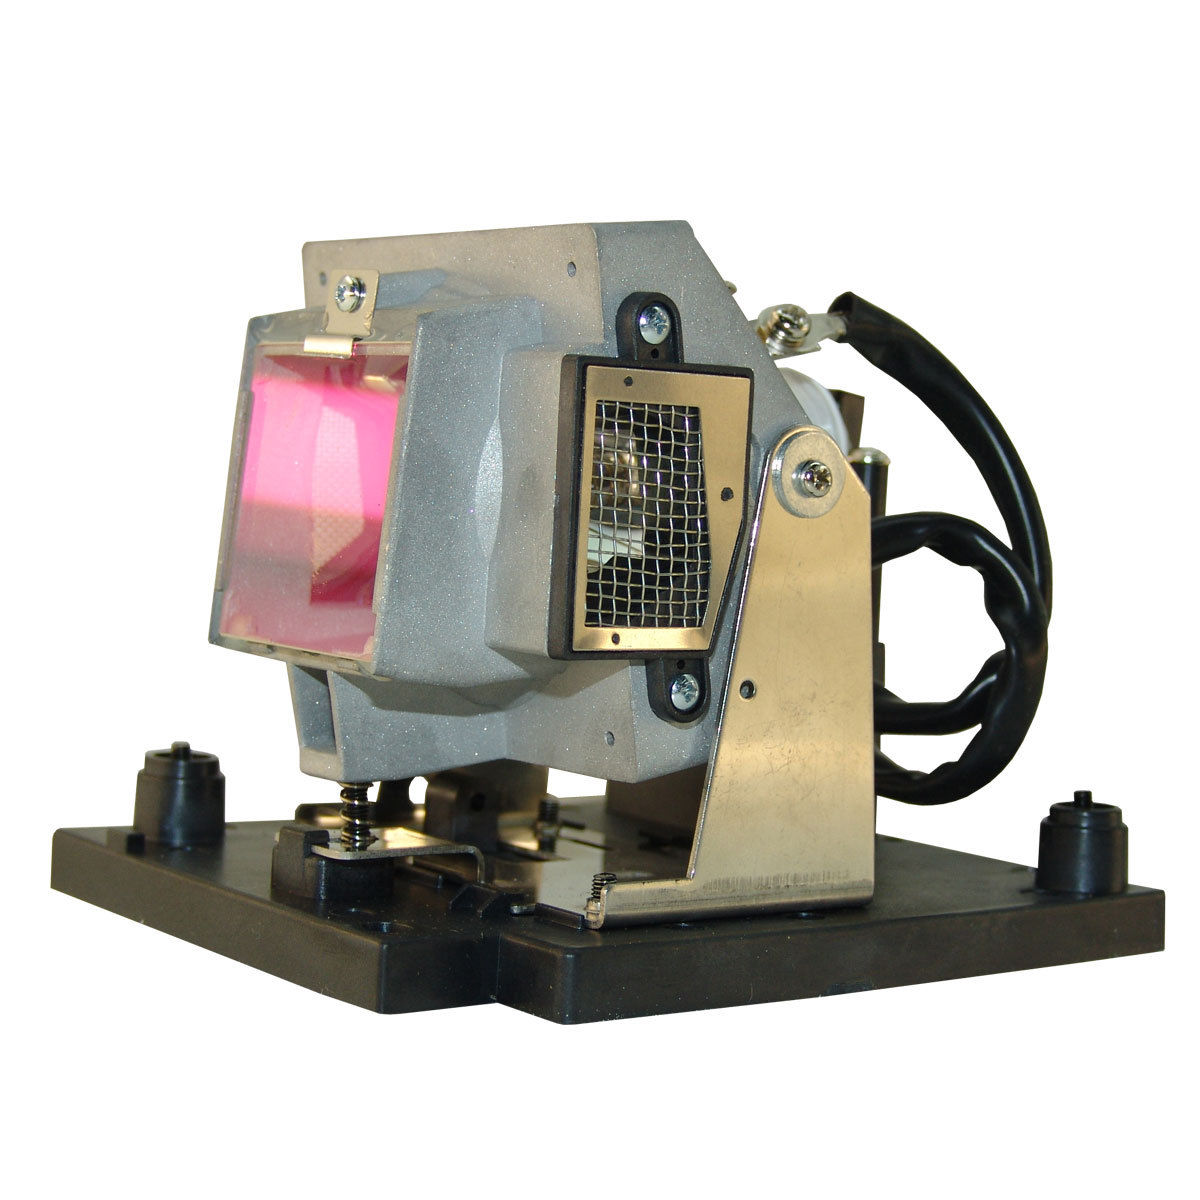 ORIGINAL PROJECTOR LAMP BULB FOR SHARP AN-PH50LP1 XG-PH50XNL AN-PH50LP2 XG-PH50X